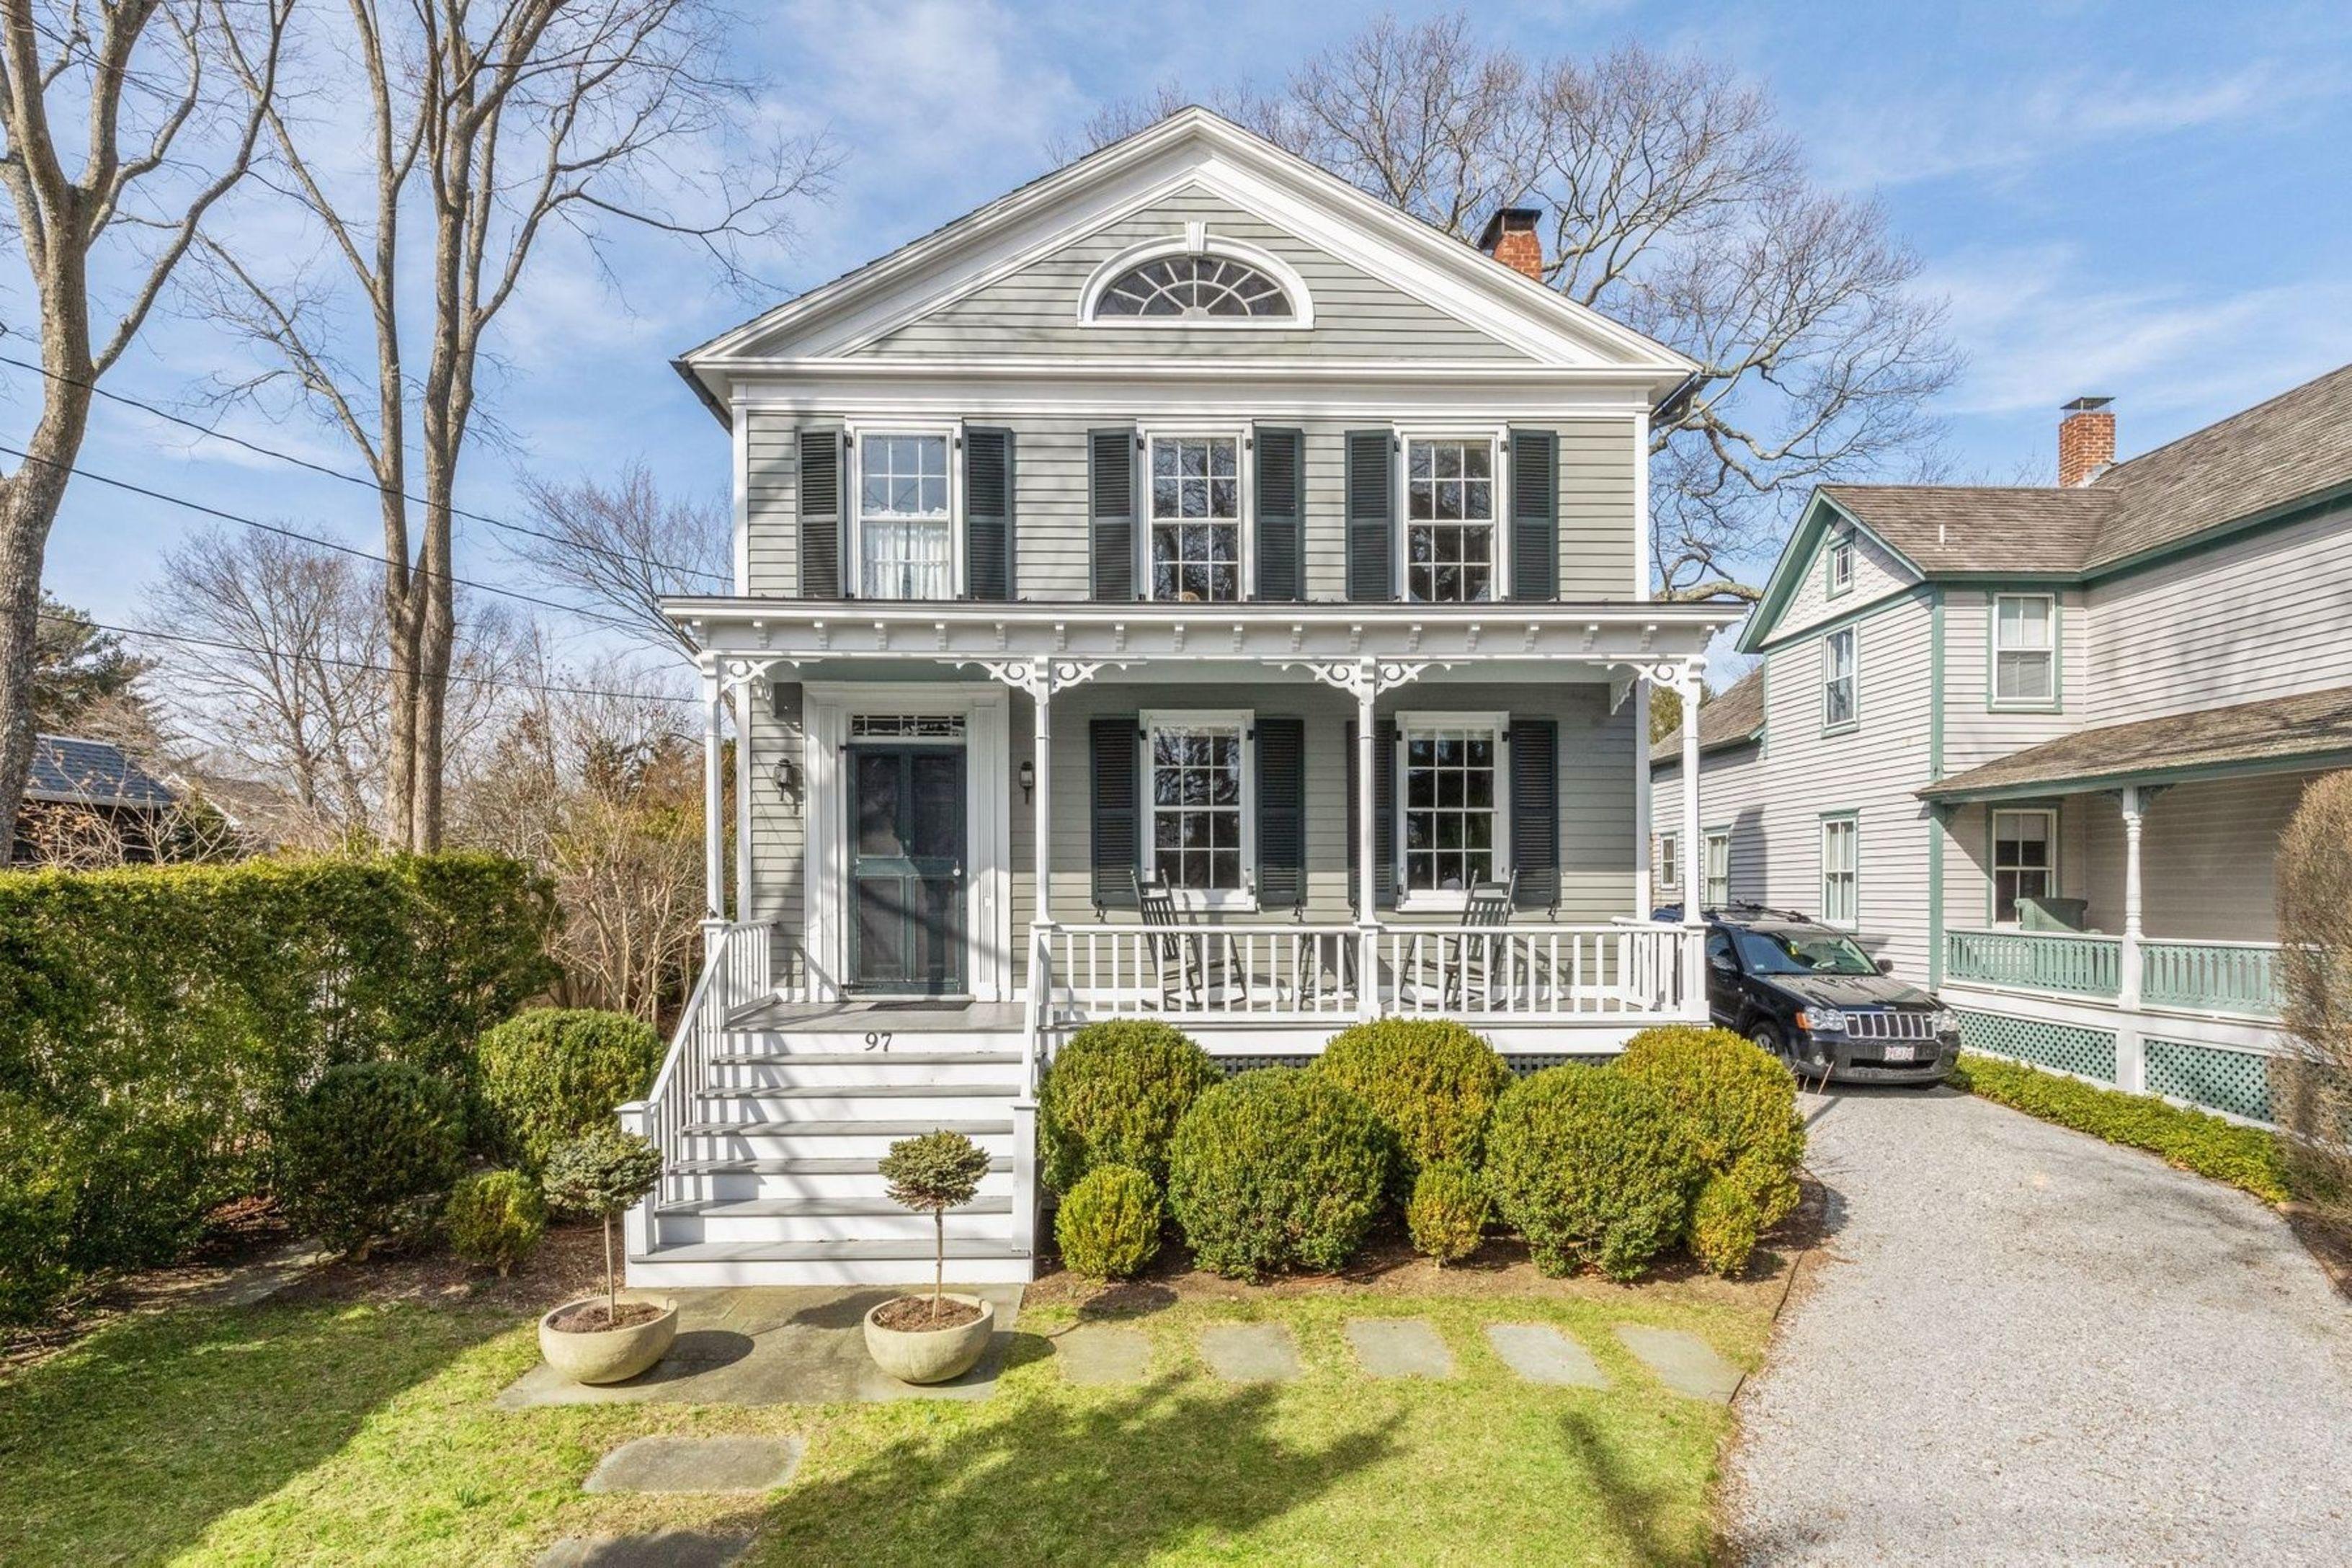 97 Hampton St - Sag Harbor Village, New York